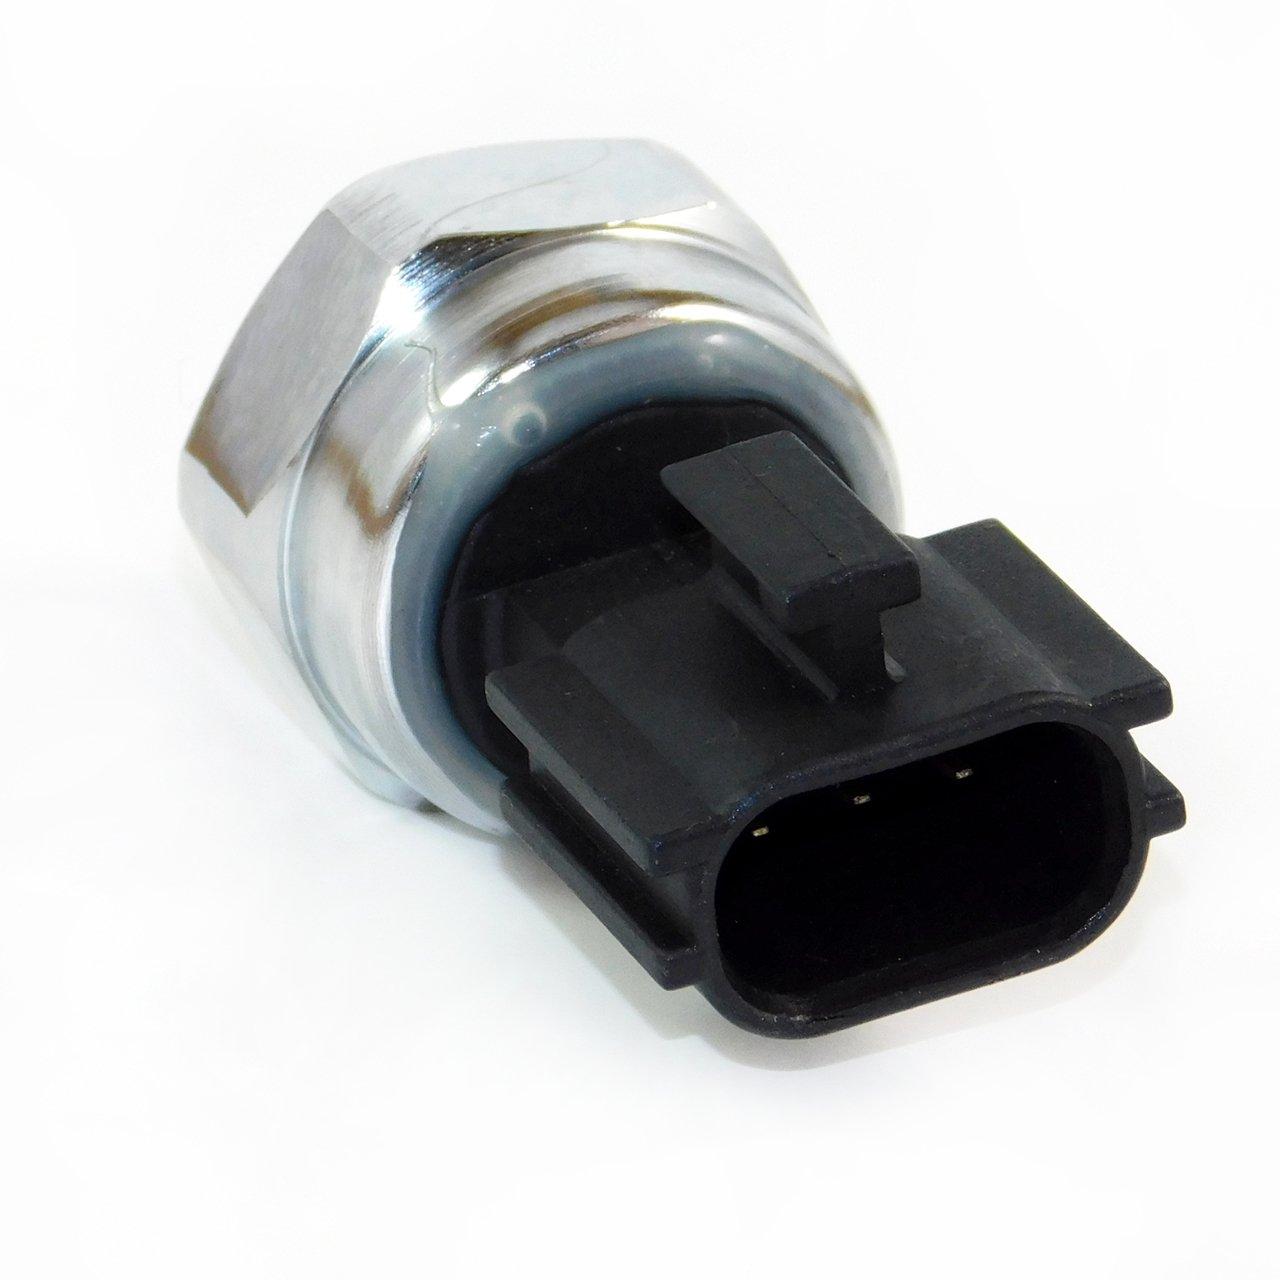 1x Oil Pressure Sensor Switch for Nissan Infiniti 25070CD000 Godaca